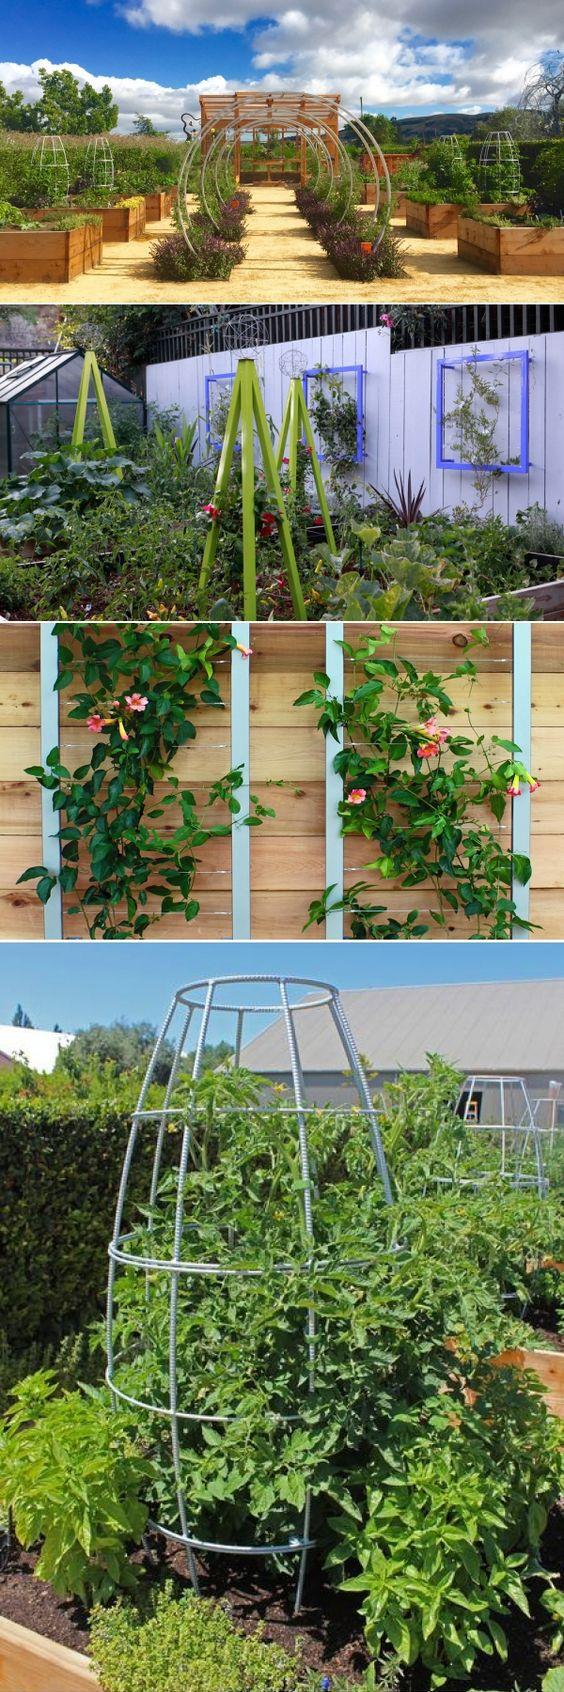 216 best Modern Trellis images on Pinterest | Garden trellis ...